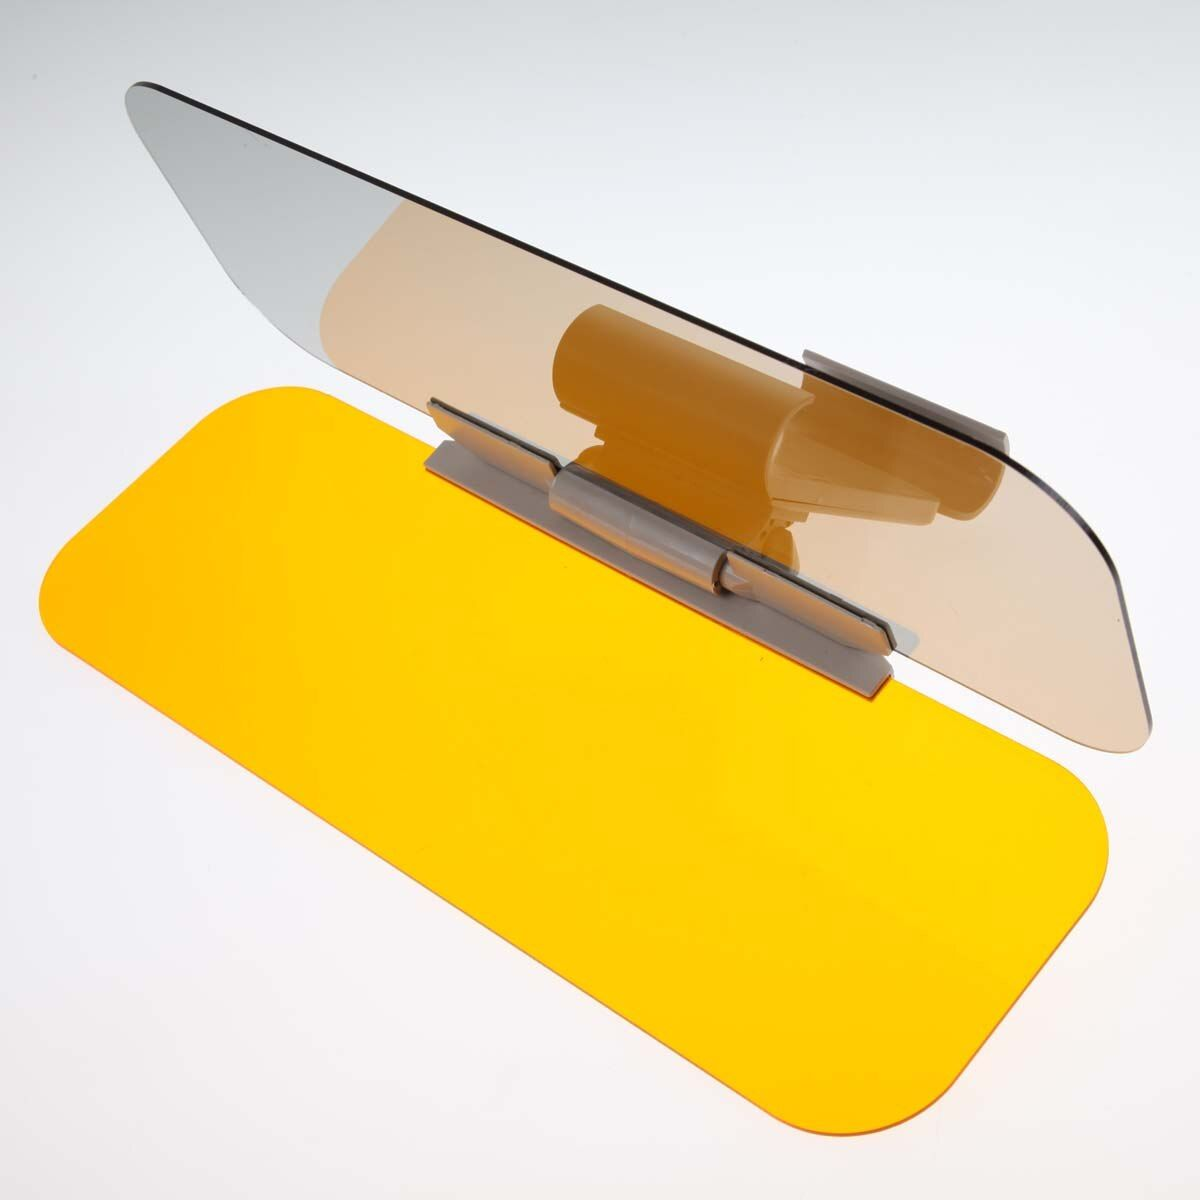 New arrival 2 in 1 Car Anti-glare Day Night Driving Glass Prevent Dazzle Mirror Goggles Mirror Sun Visors Shade Free shipping